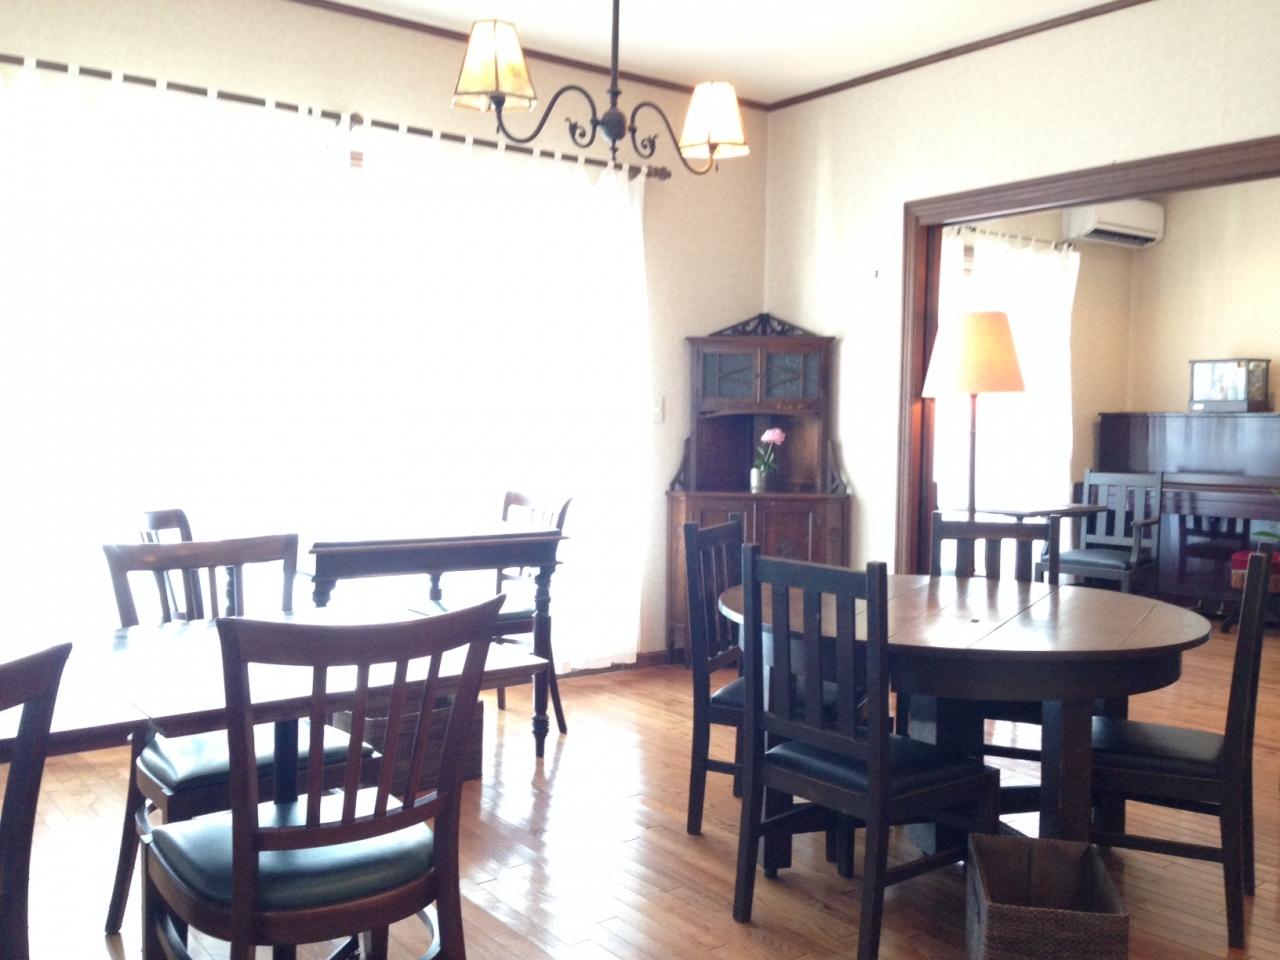 Salle à manger de Yoshino(サラマンジェ・ド・ヨシノ)